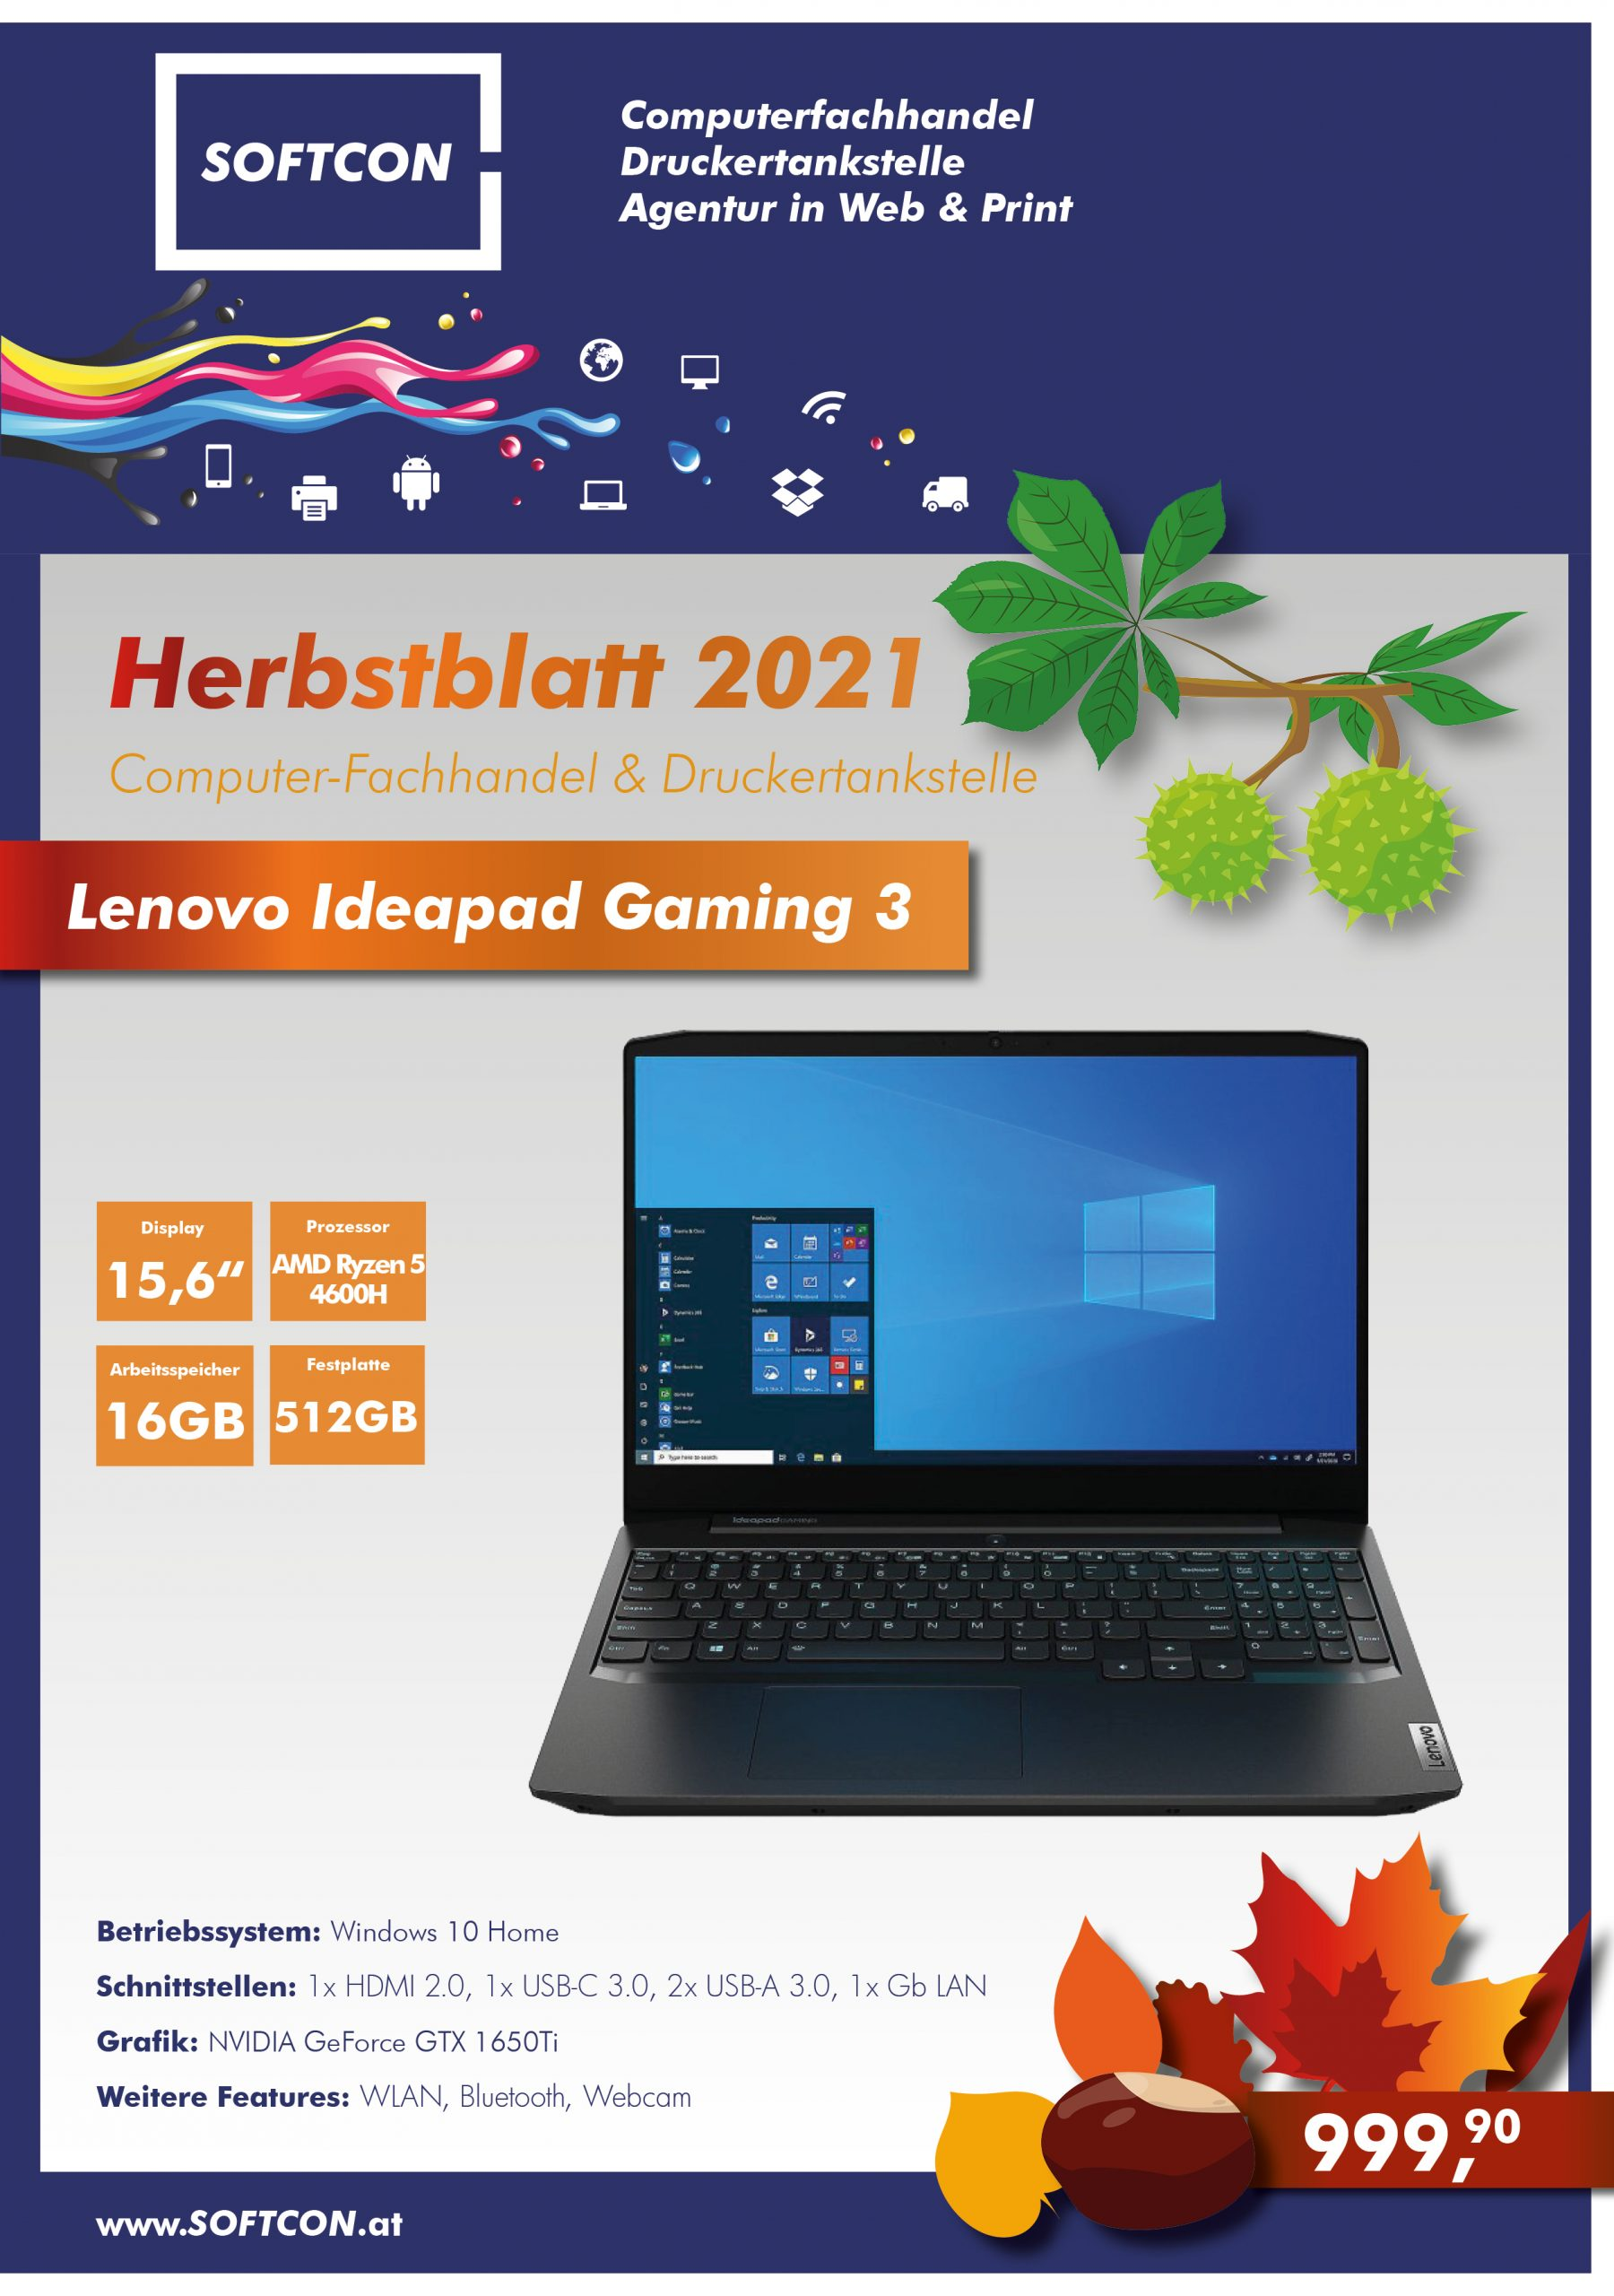 Herbstblatt 2021